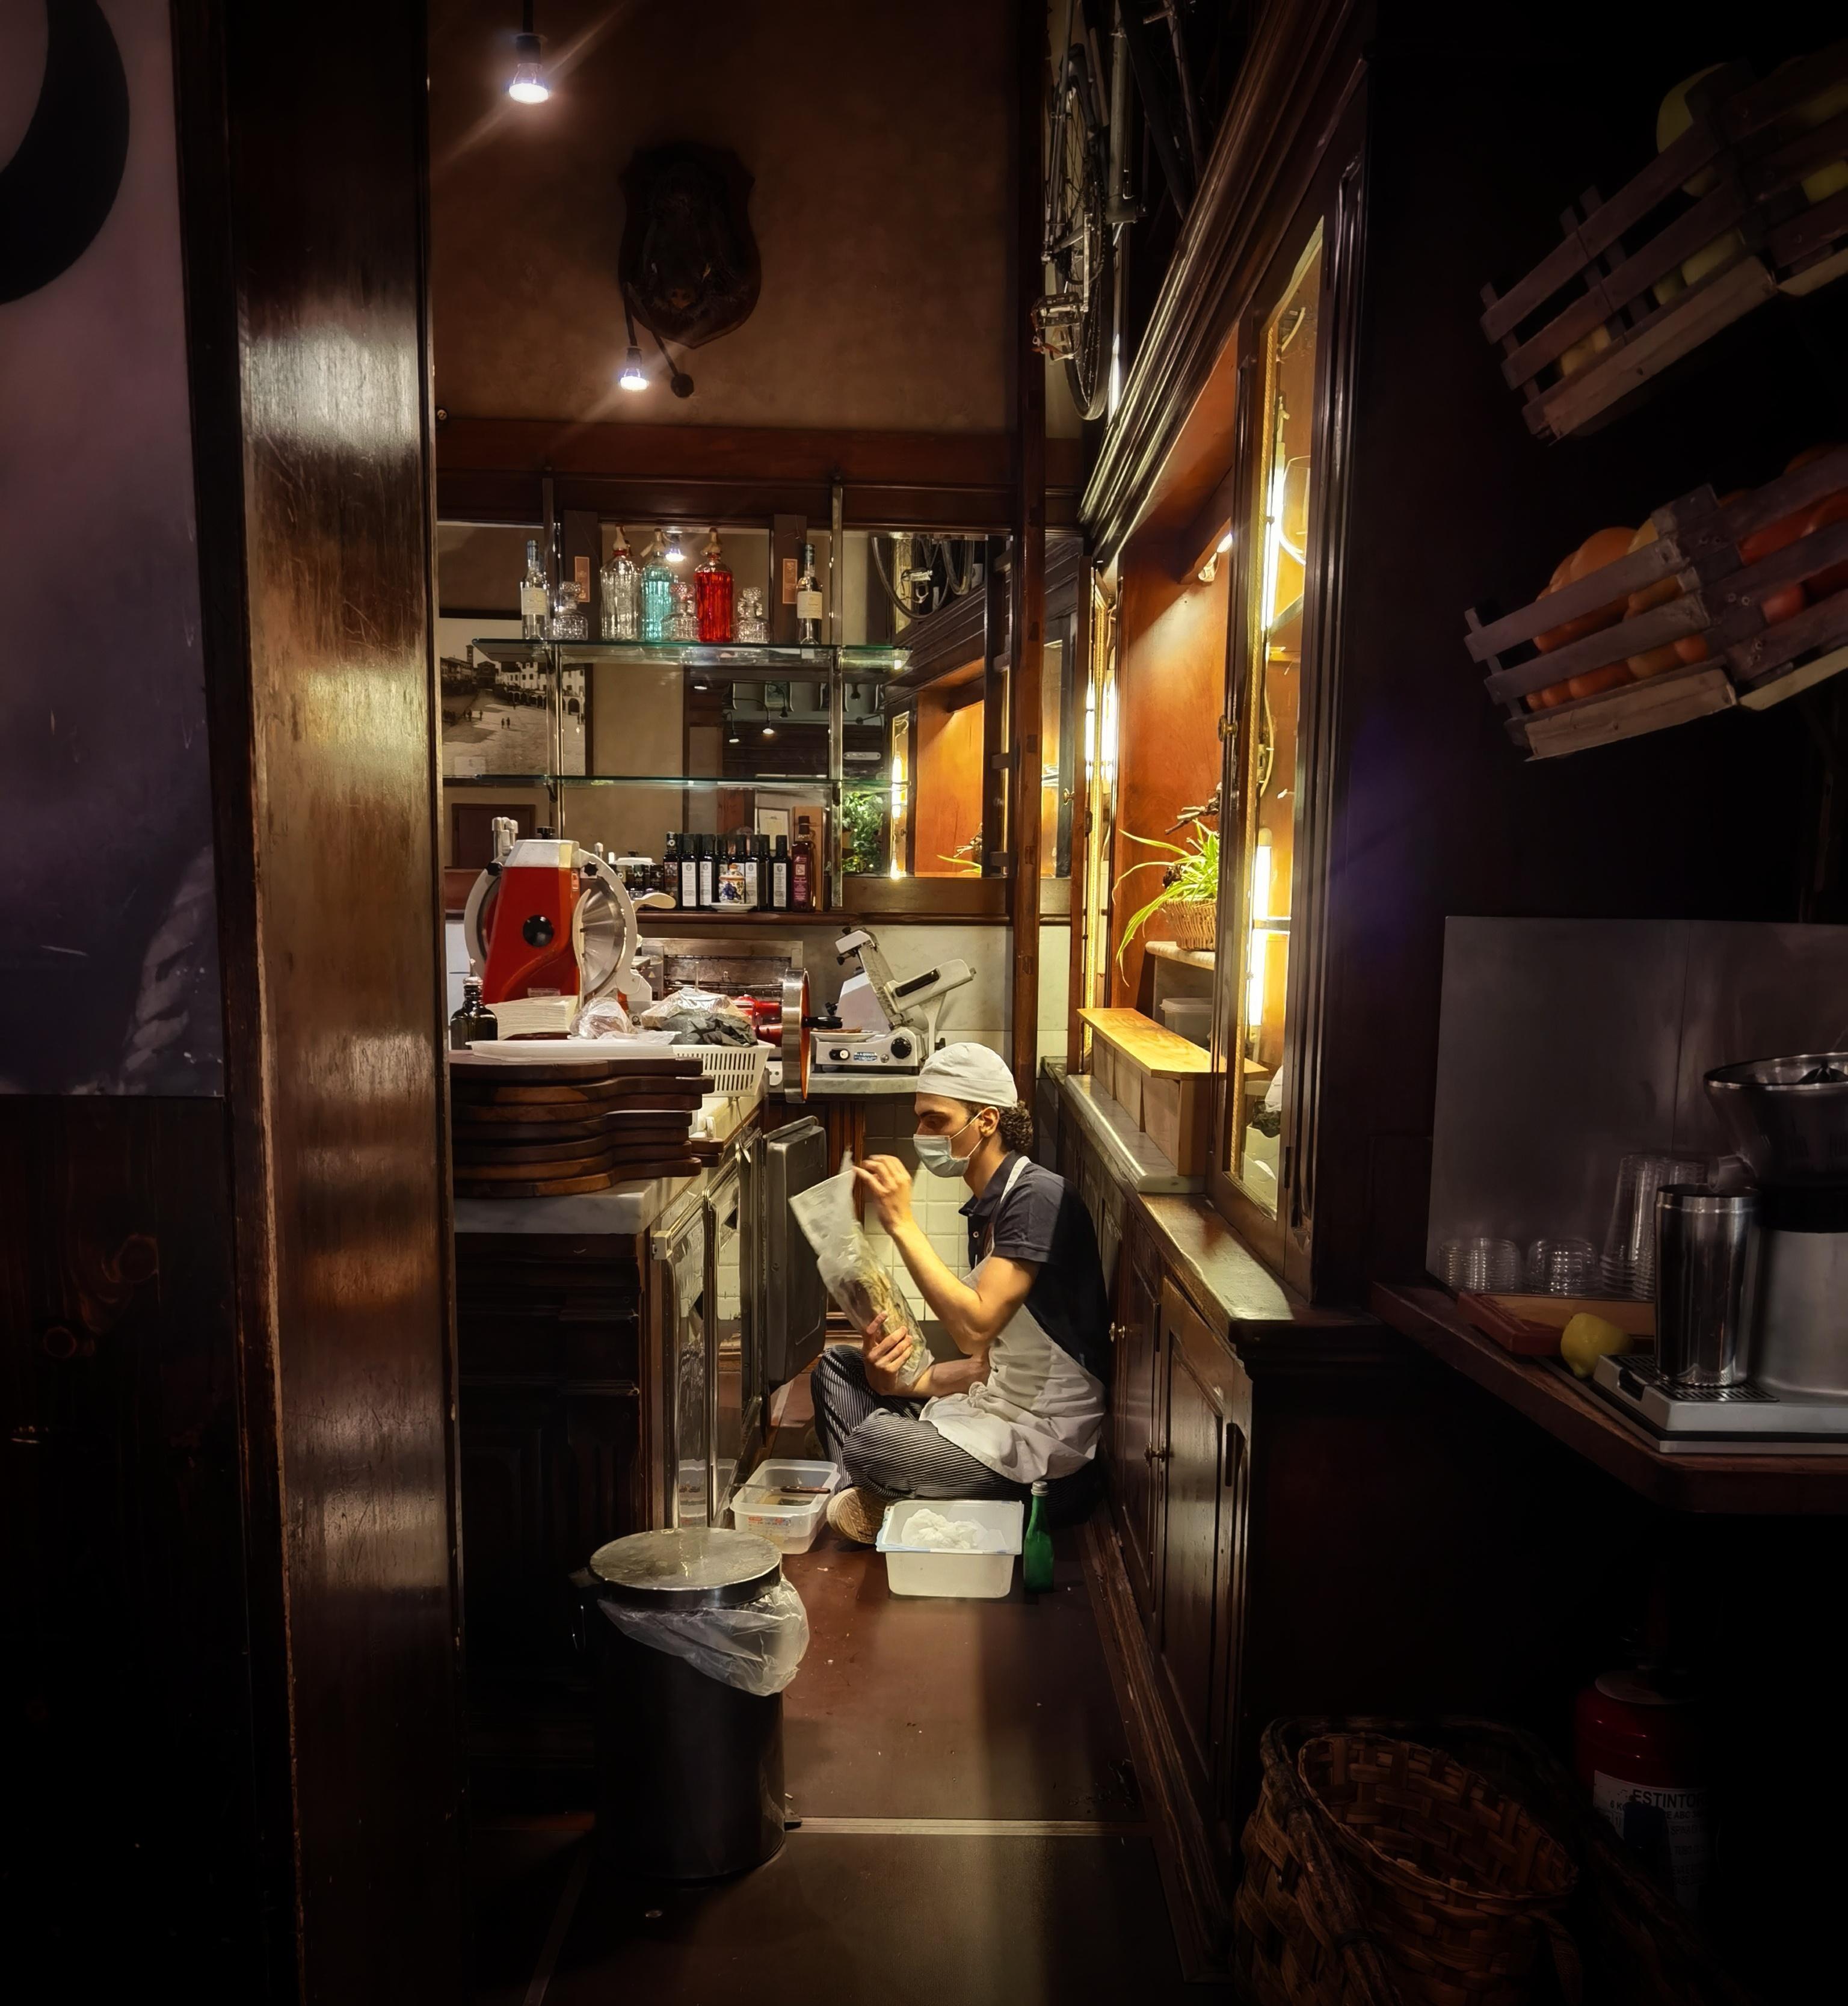 Кафе «Cantinetta Verrazzano» во Флоренции. Фотограф BalalaikaTheBear